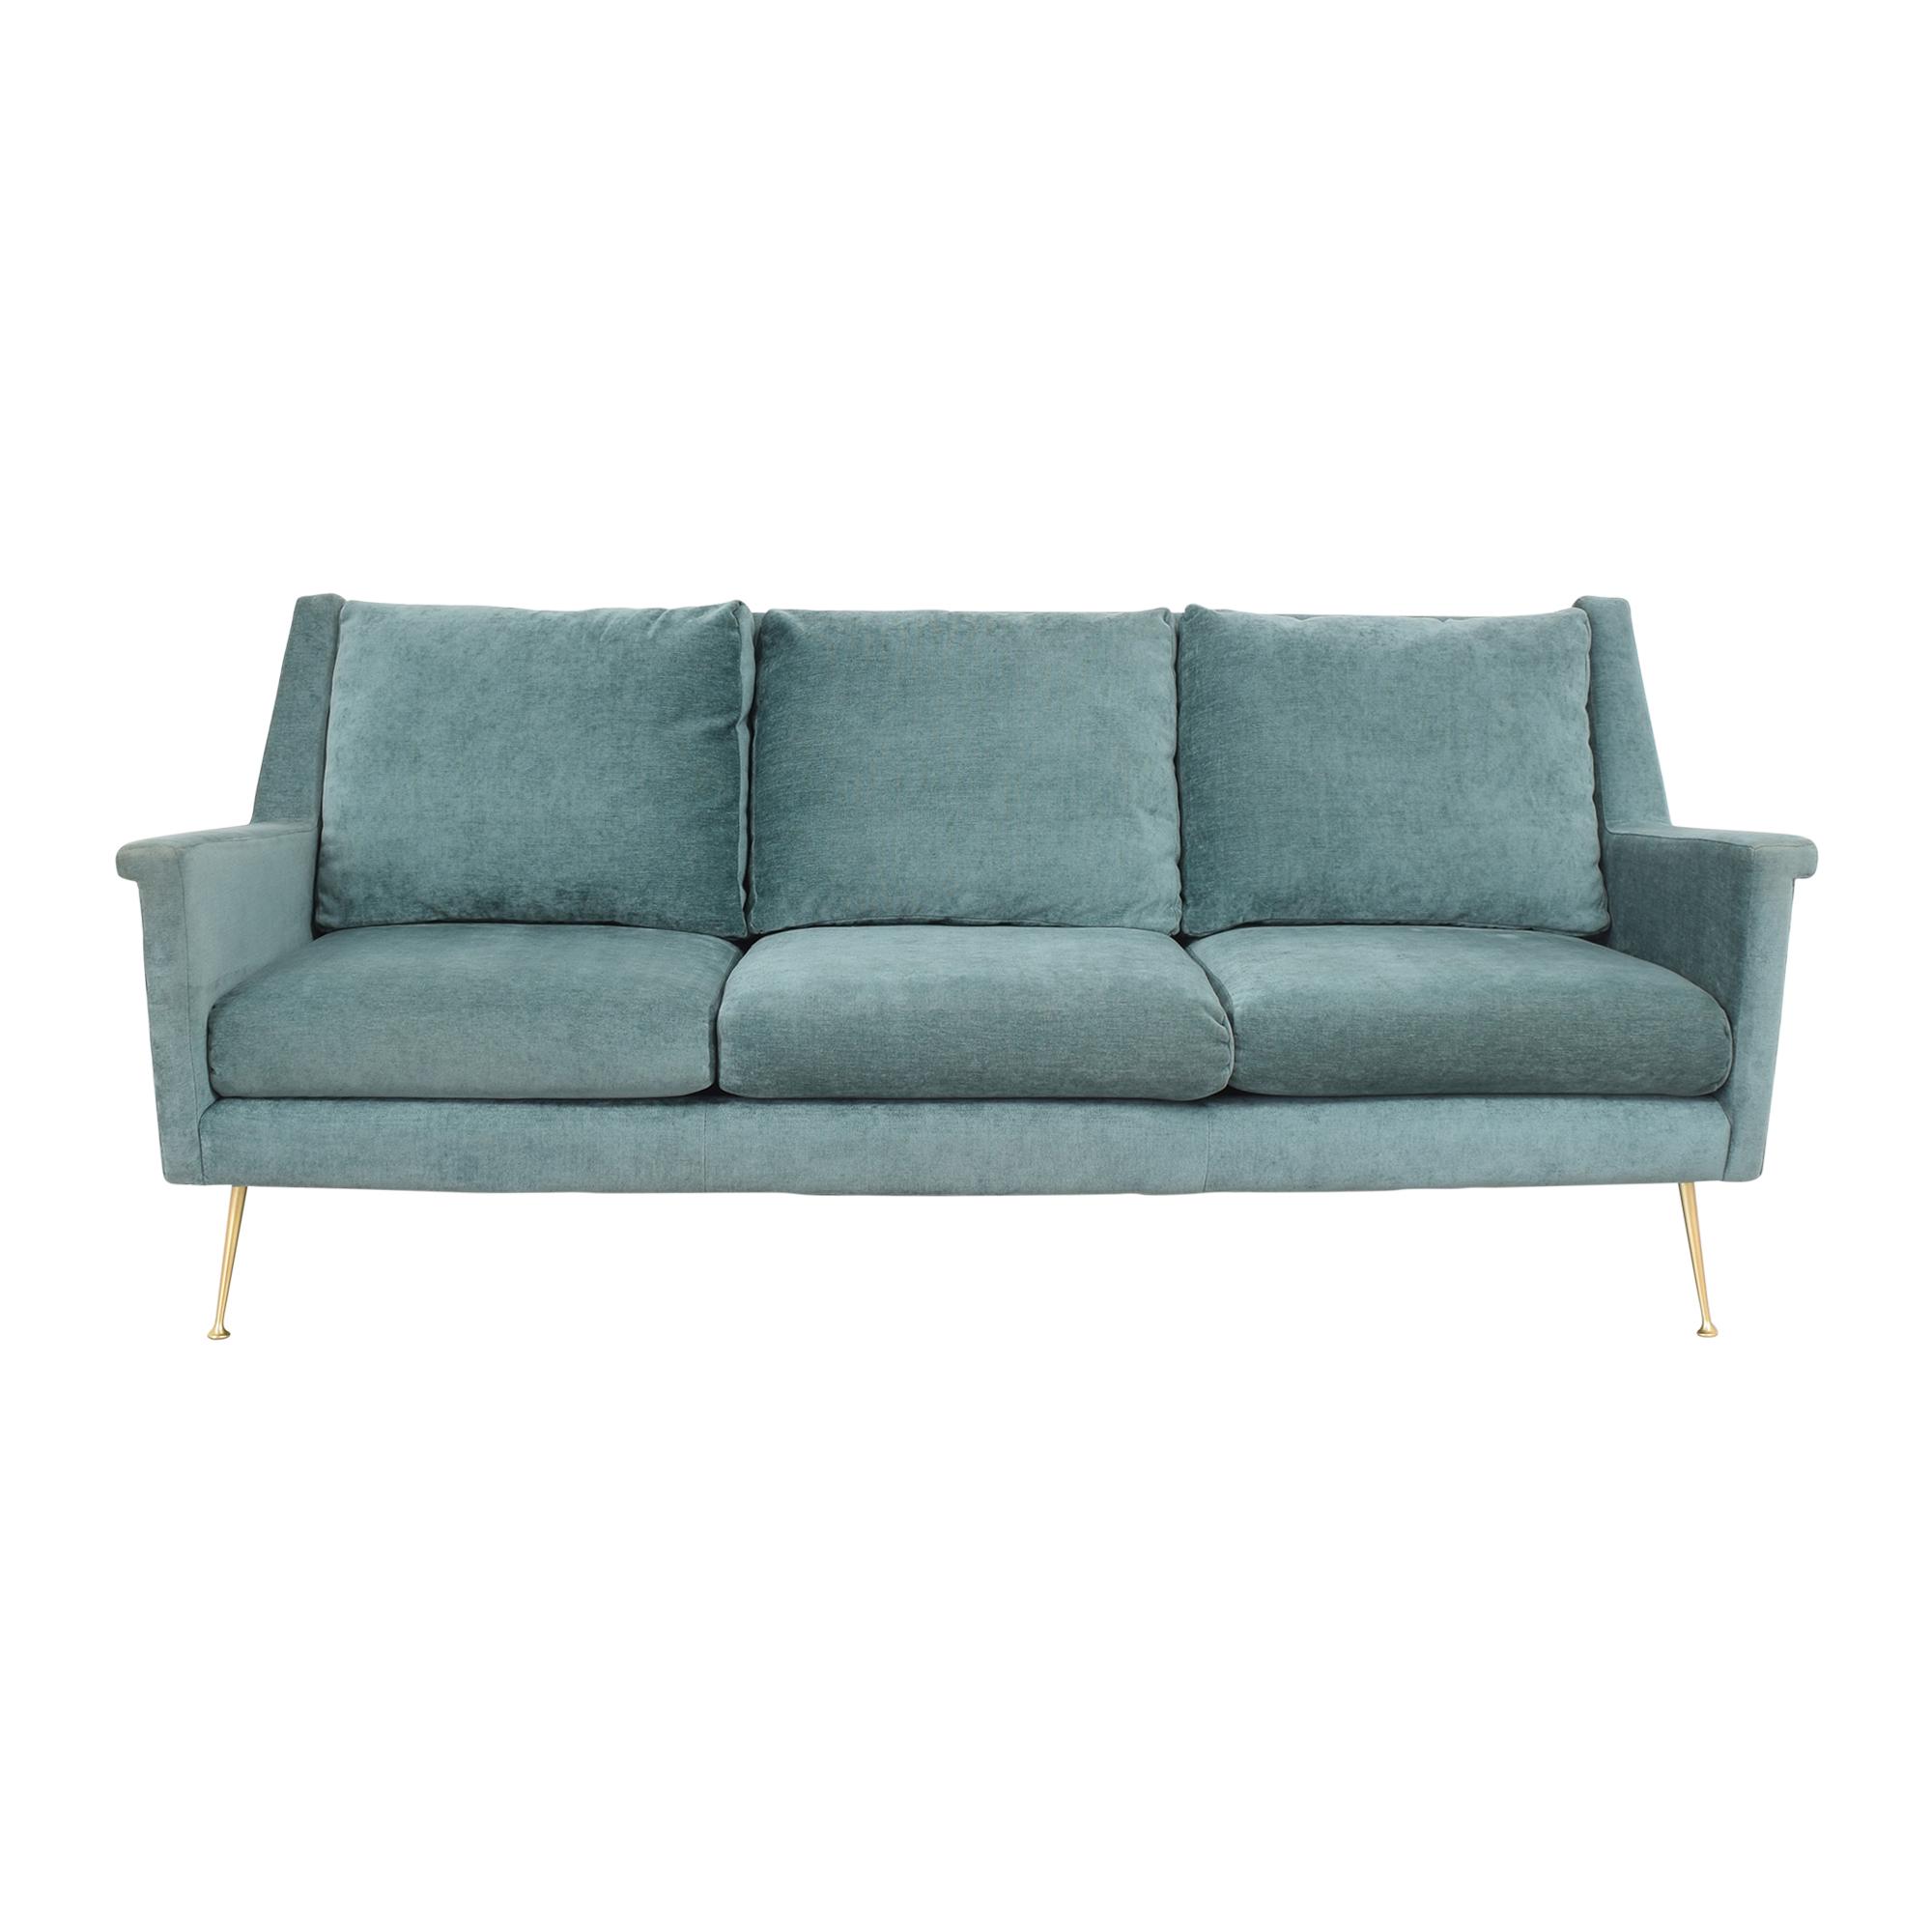 West Elm West Elm Carlo Mid Century Sofa Blue